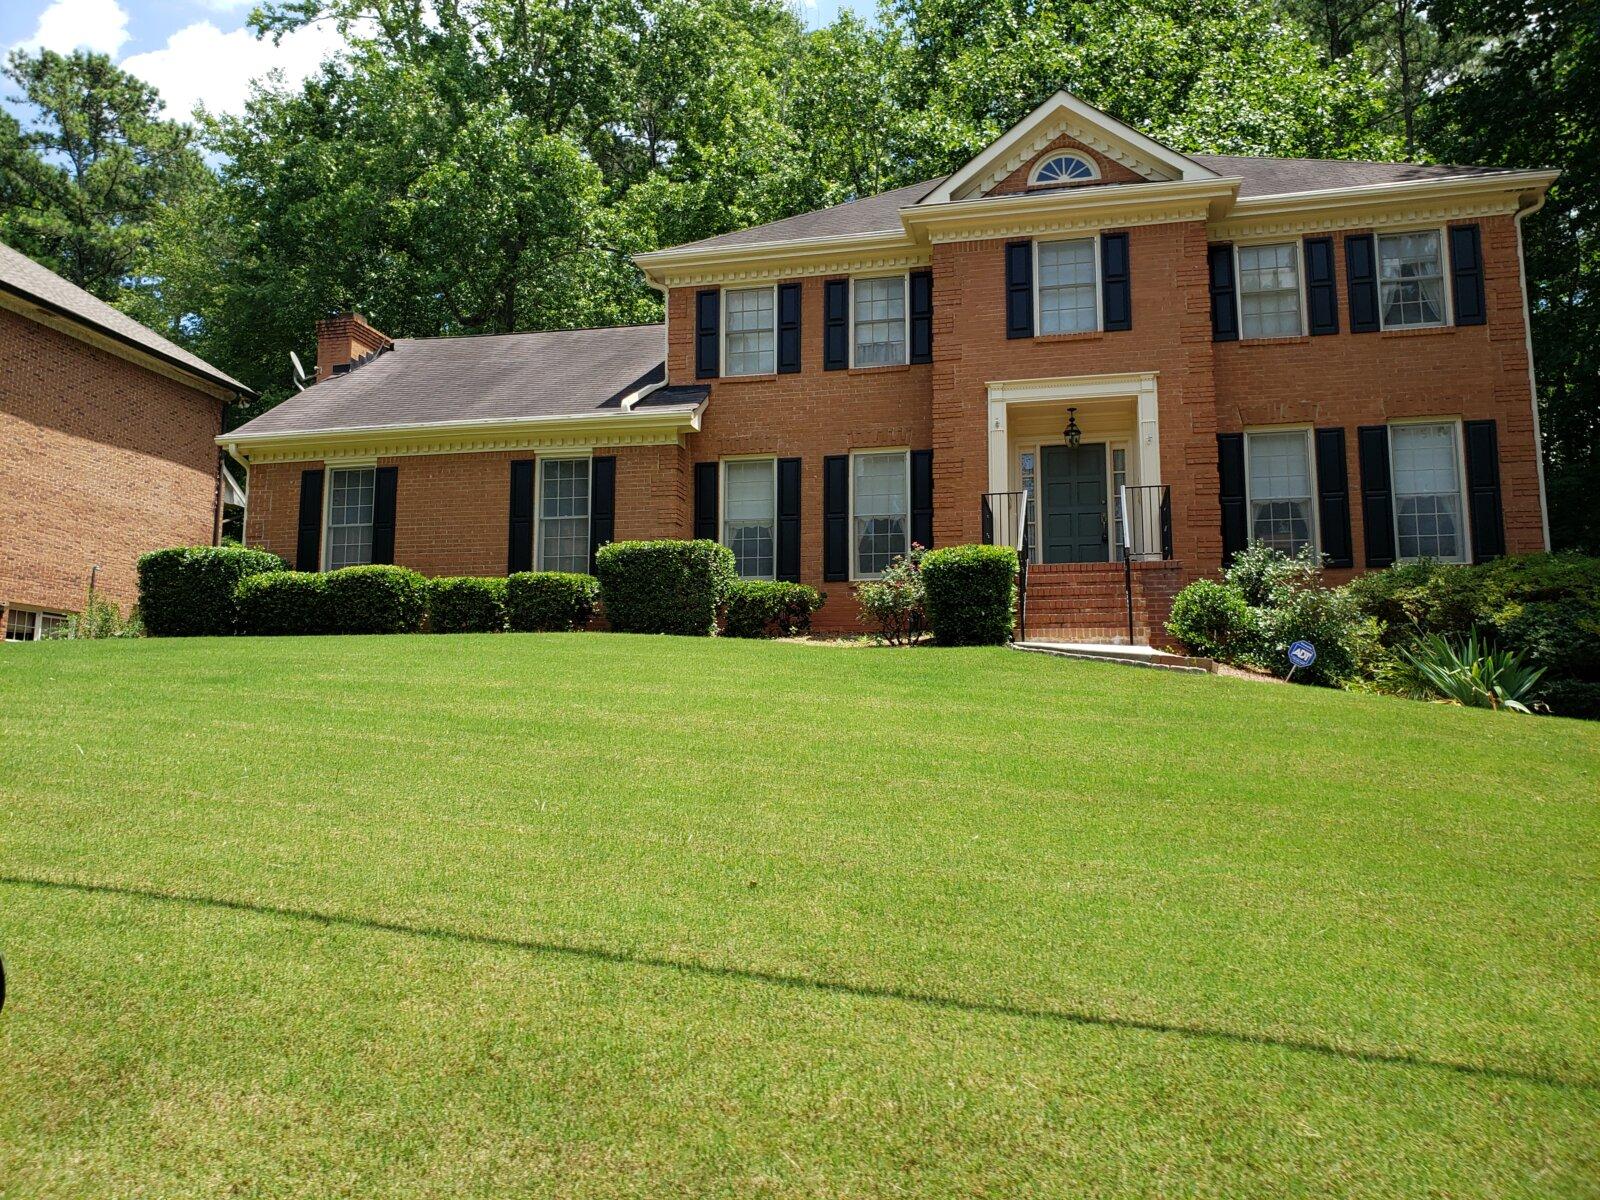 A picture of a random house in Atlanta Georgia